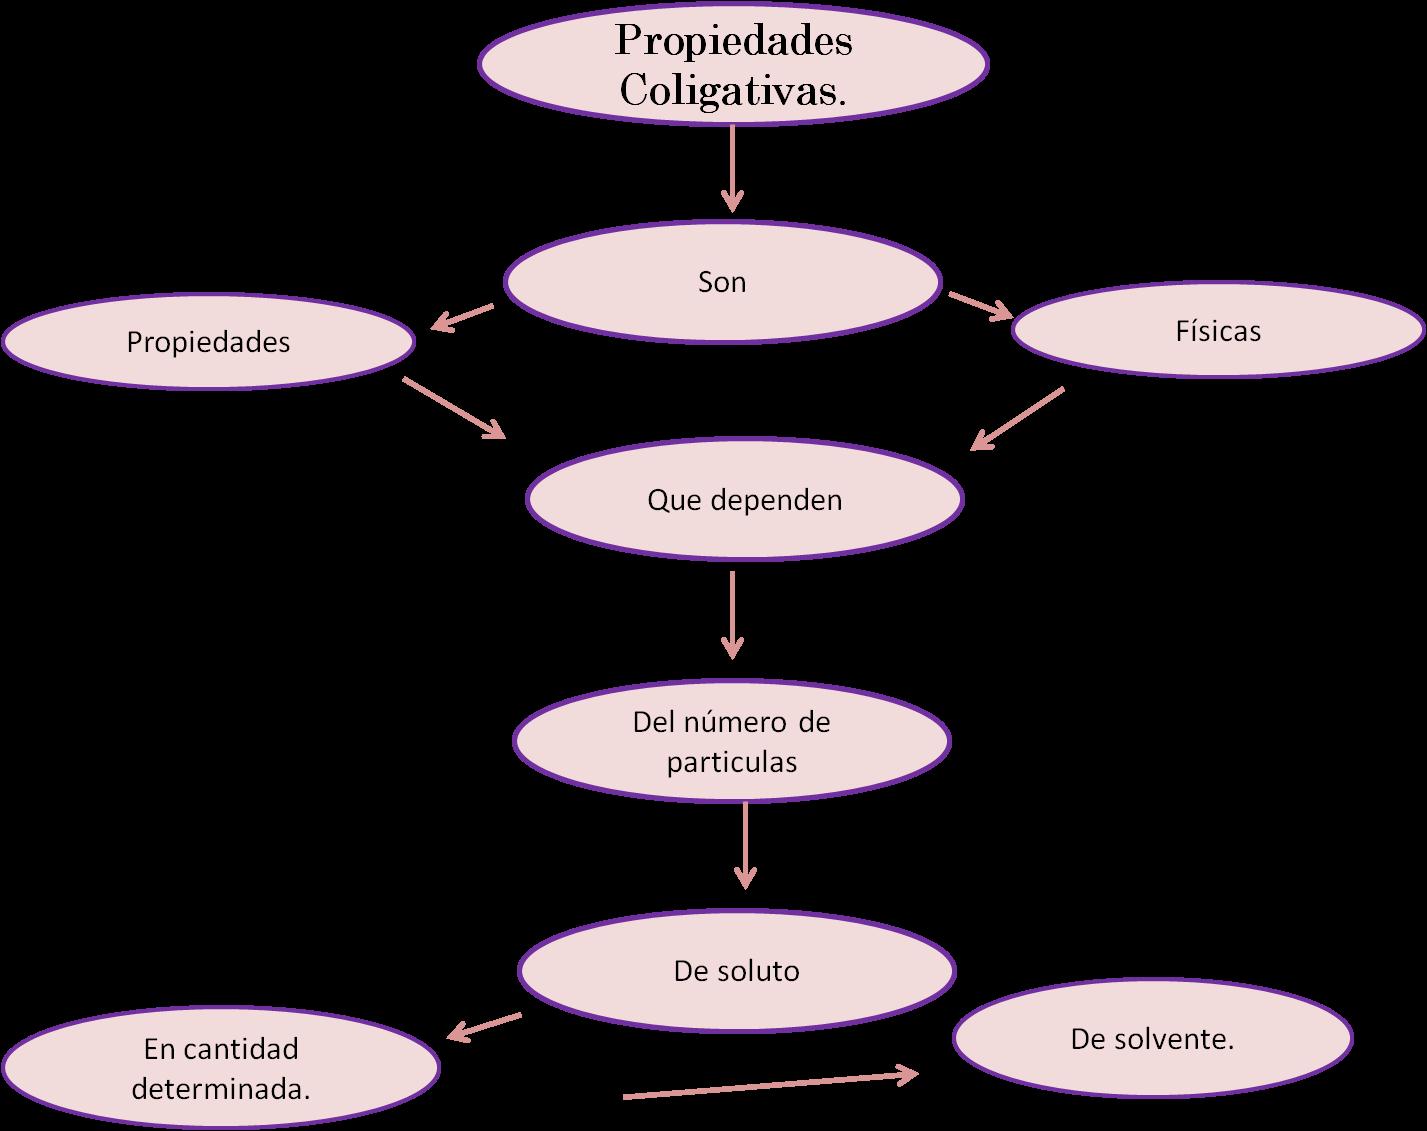 Propiedades coligativas for Inmobiliaria o inmobiliaria